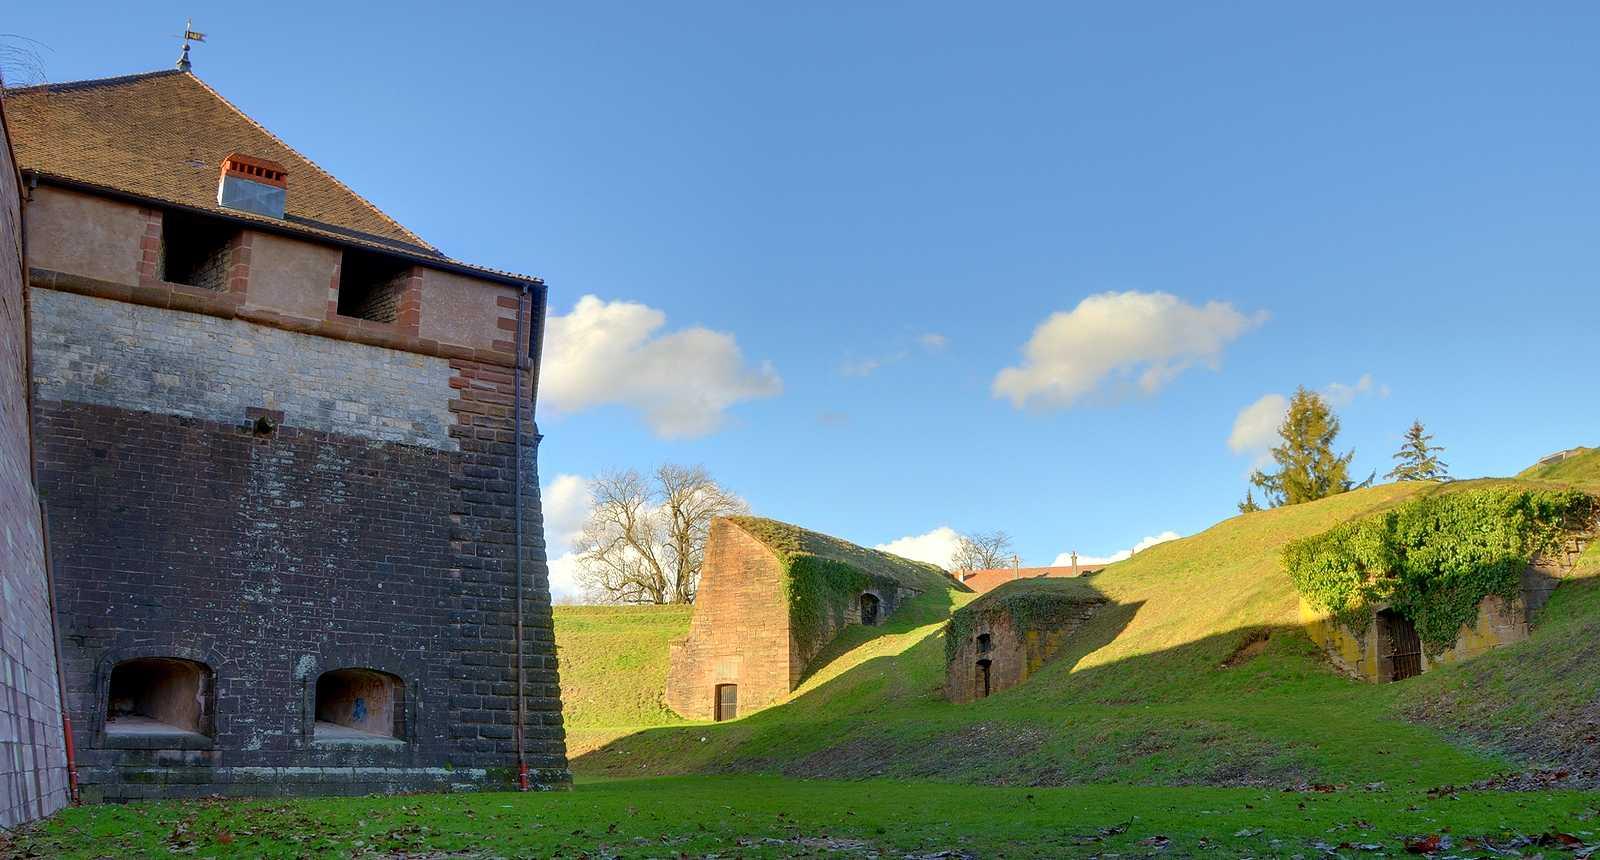 Les Fortifications de la Citadelle de Belfort